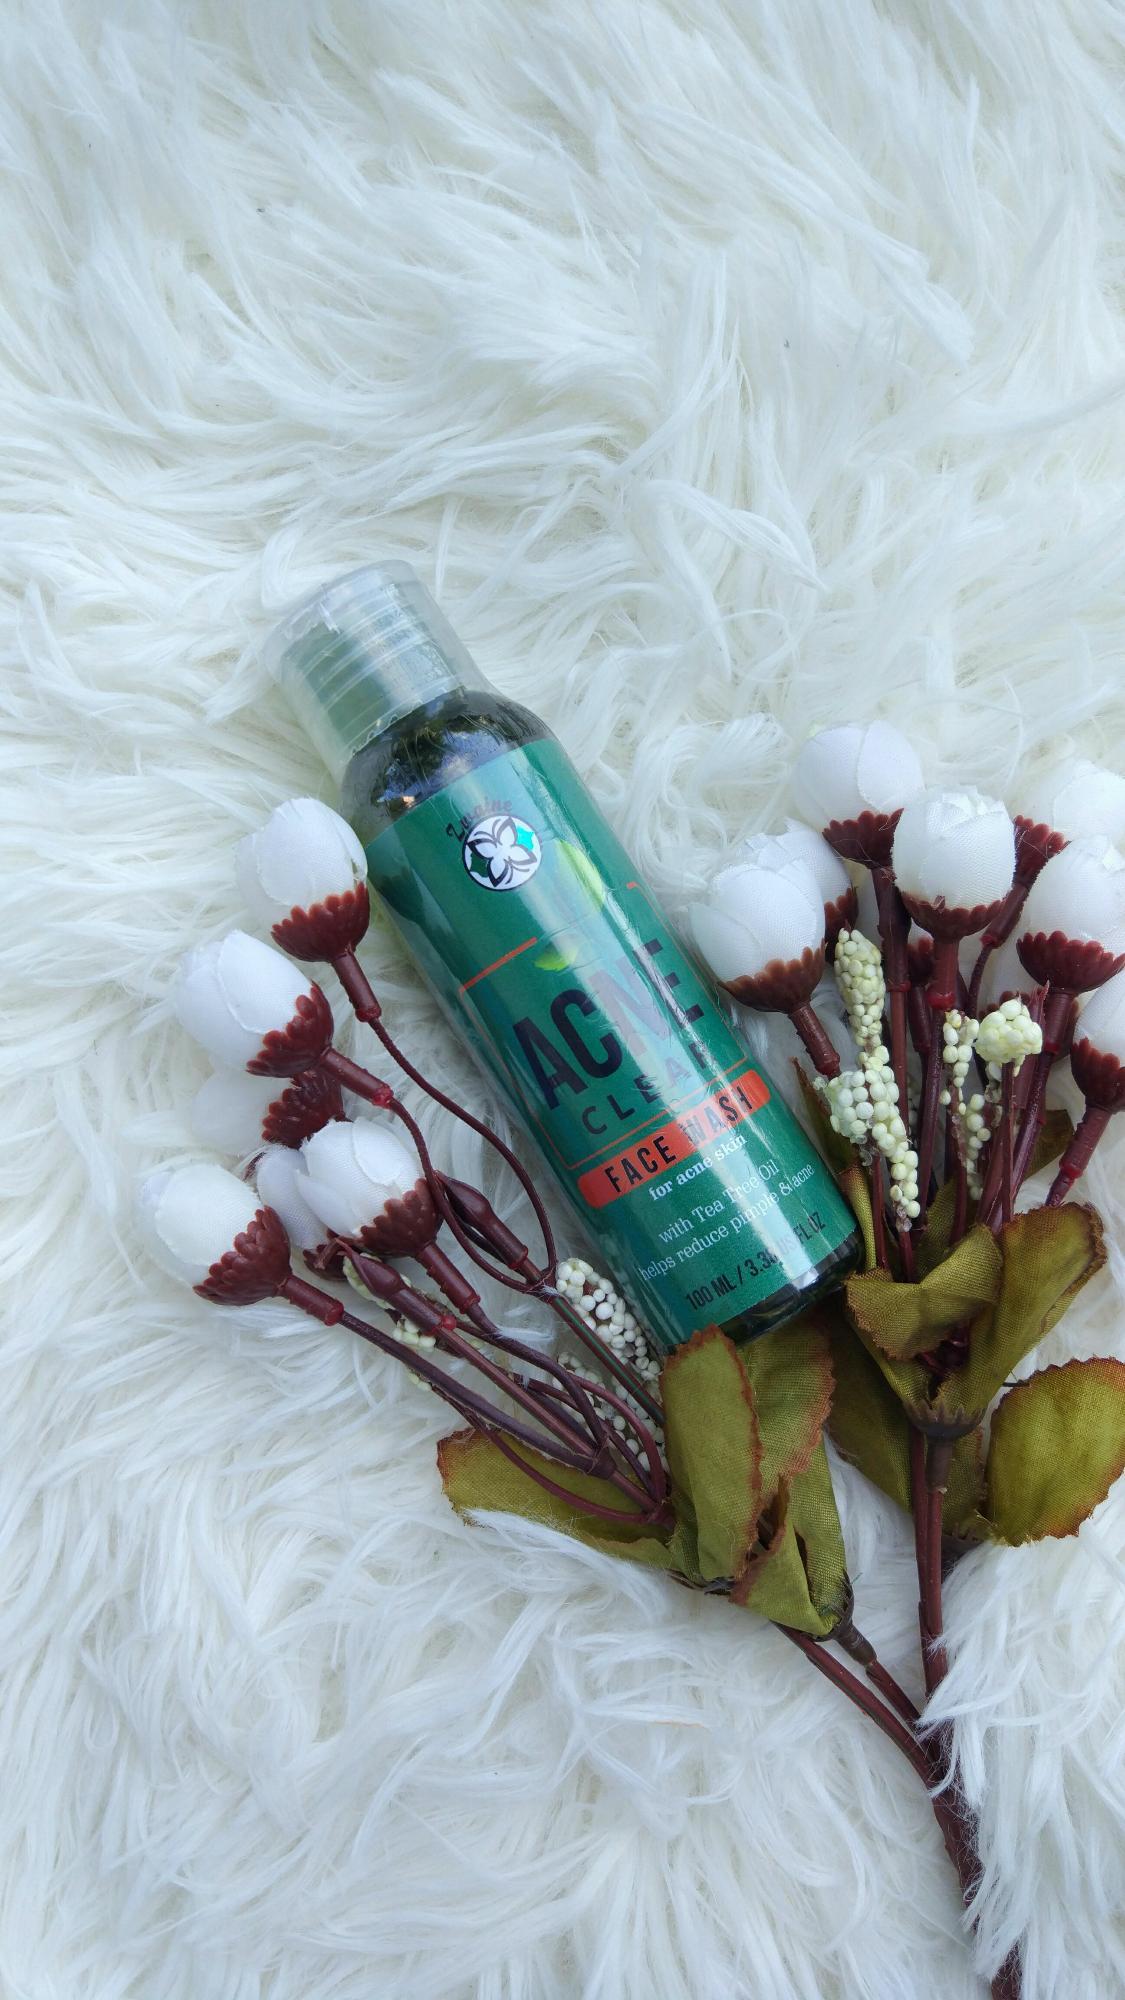 Toko Sabun Wajah Acne Jerawat Tto Tea Tree Oil Terlengkap Banten